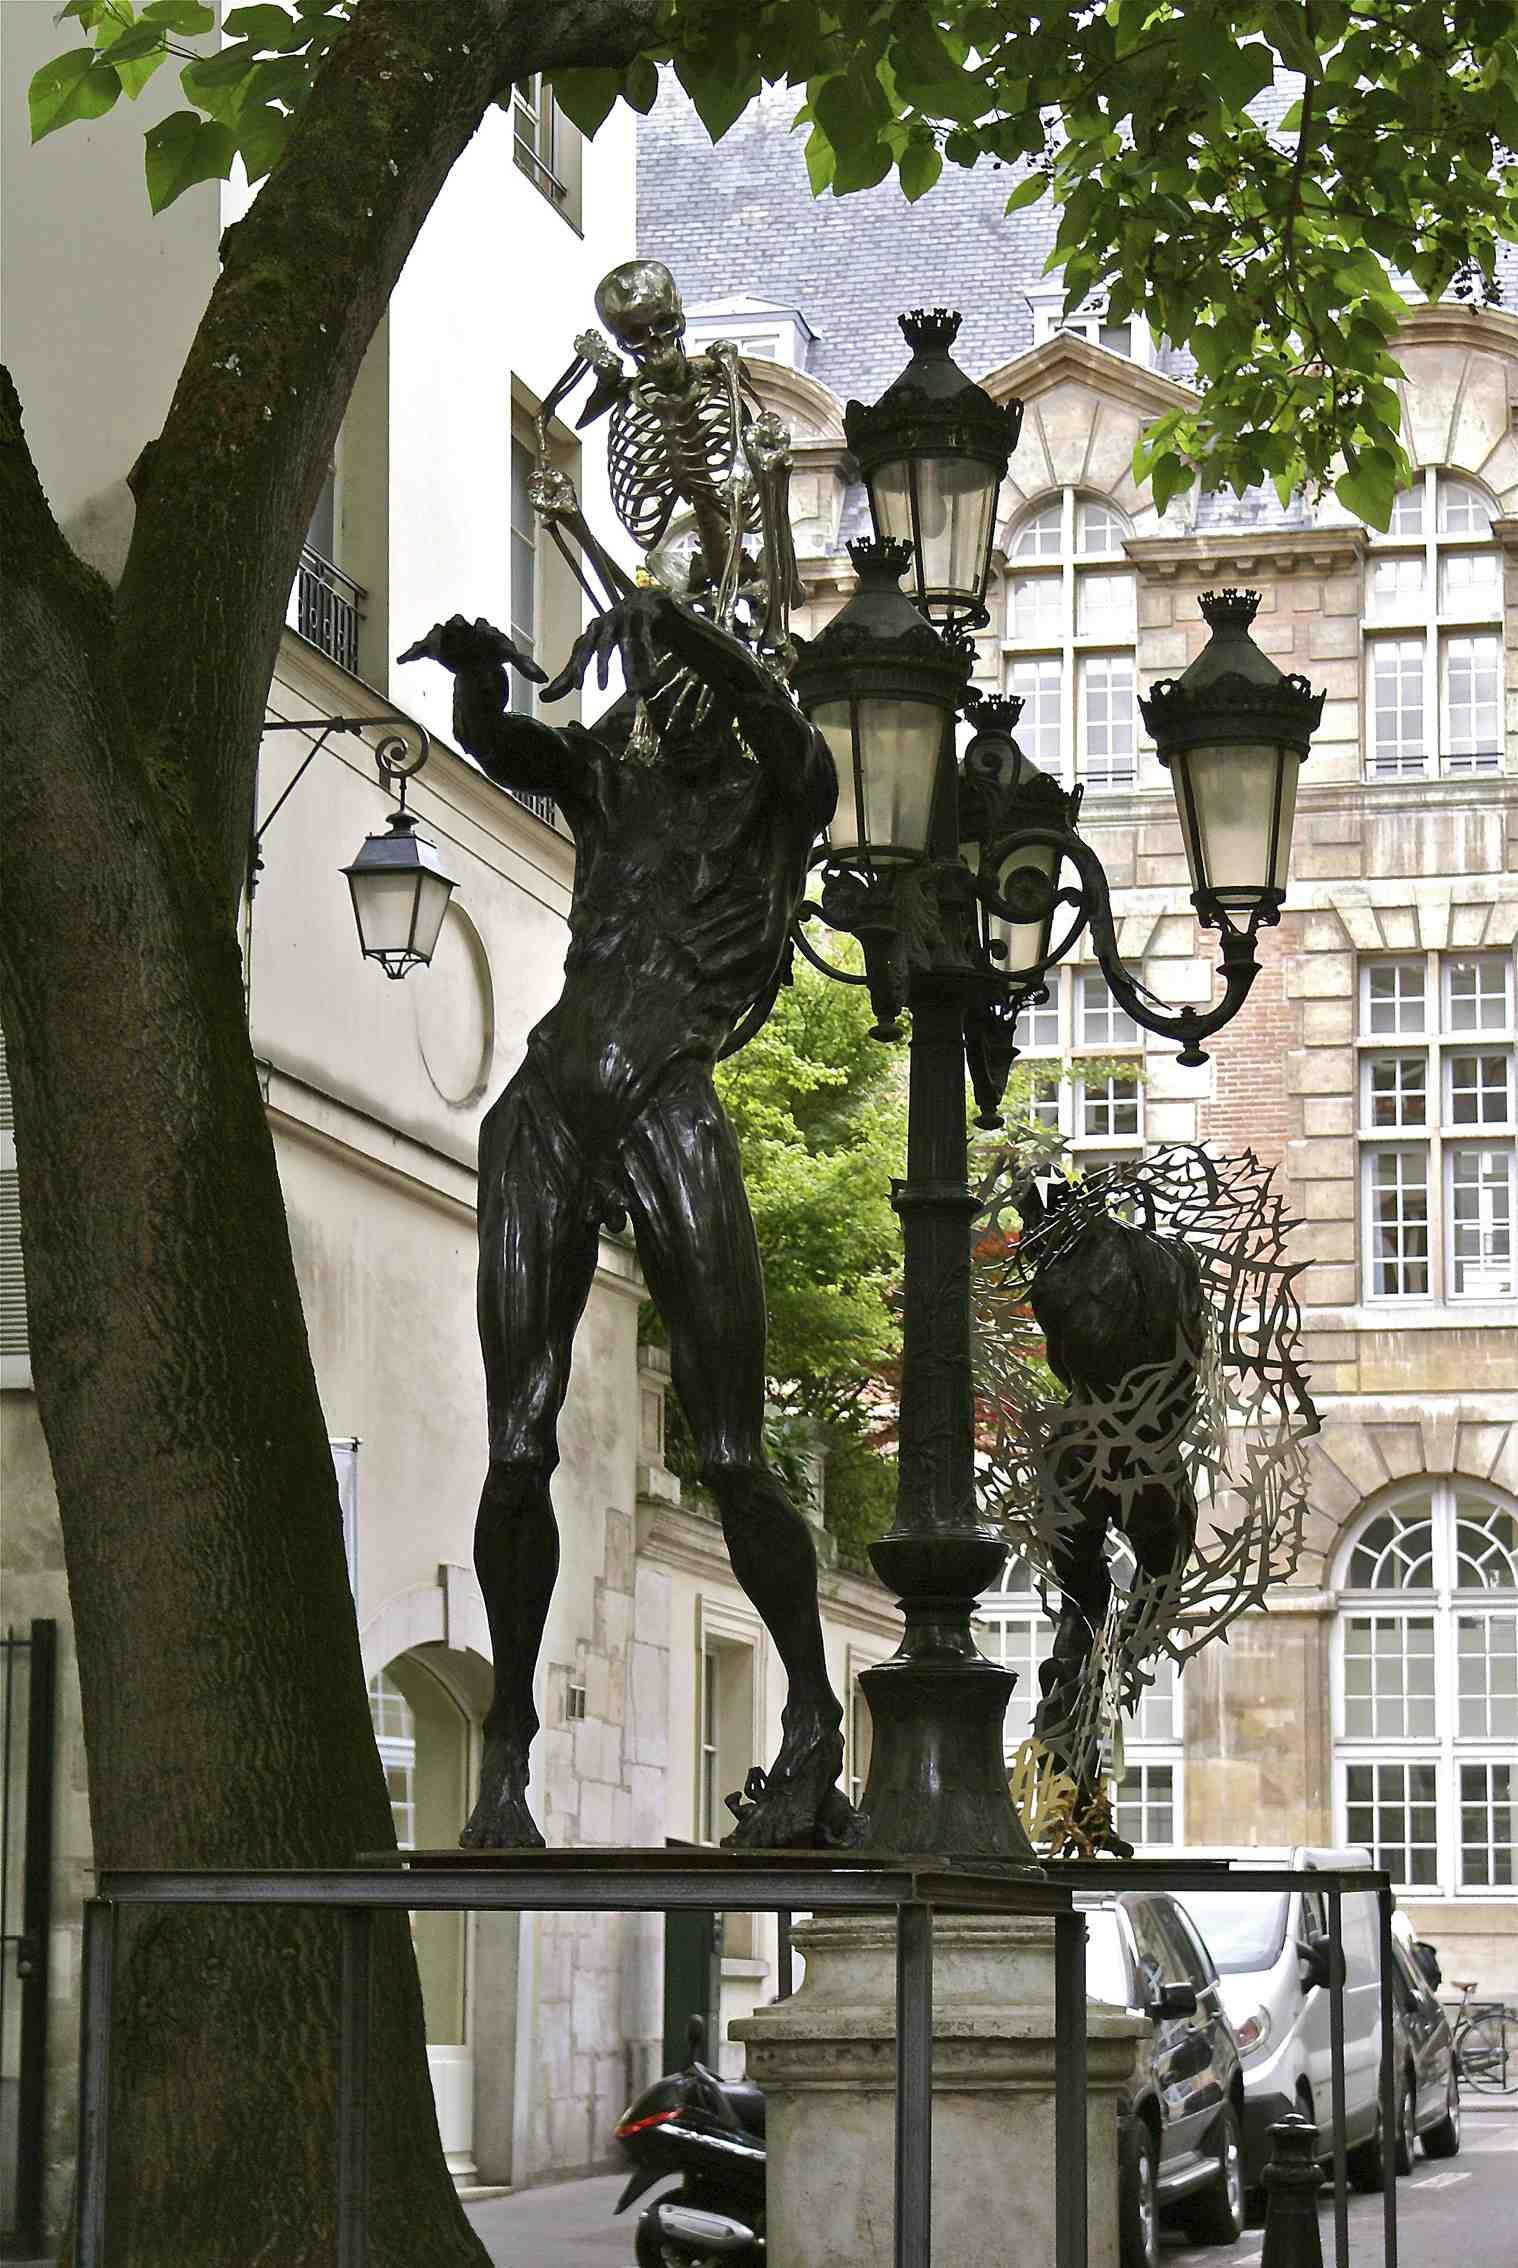 Daniel_Hourdé_-_Colin_Maillard_-_Expo_place_Furstenberg,_Paris_2011.jpg